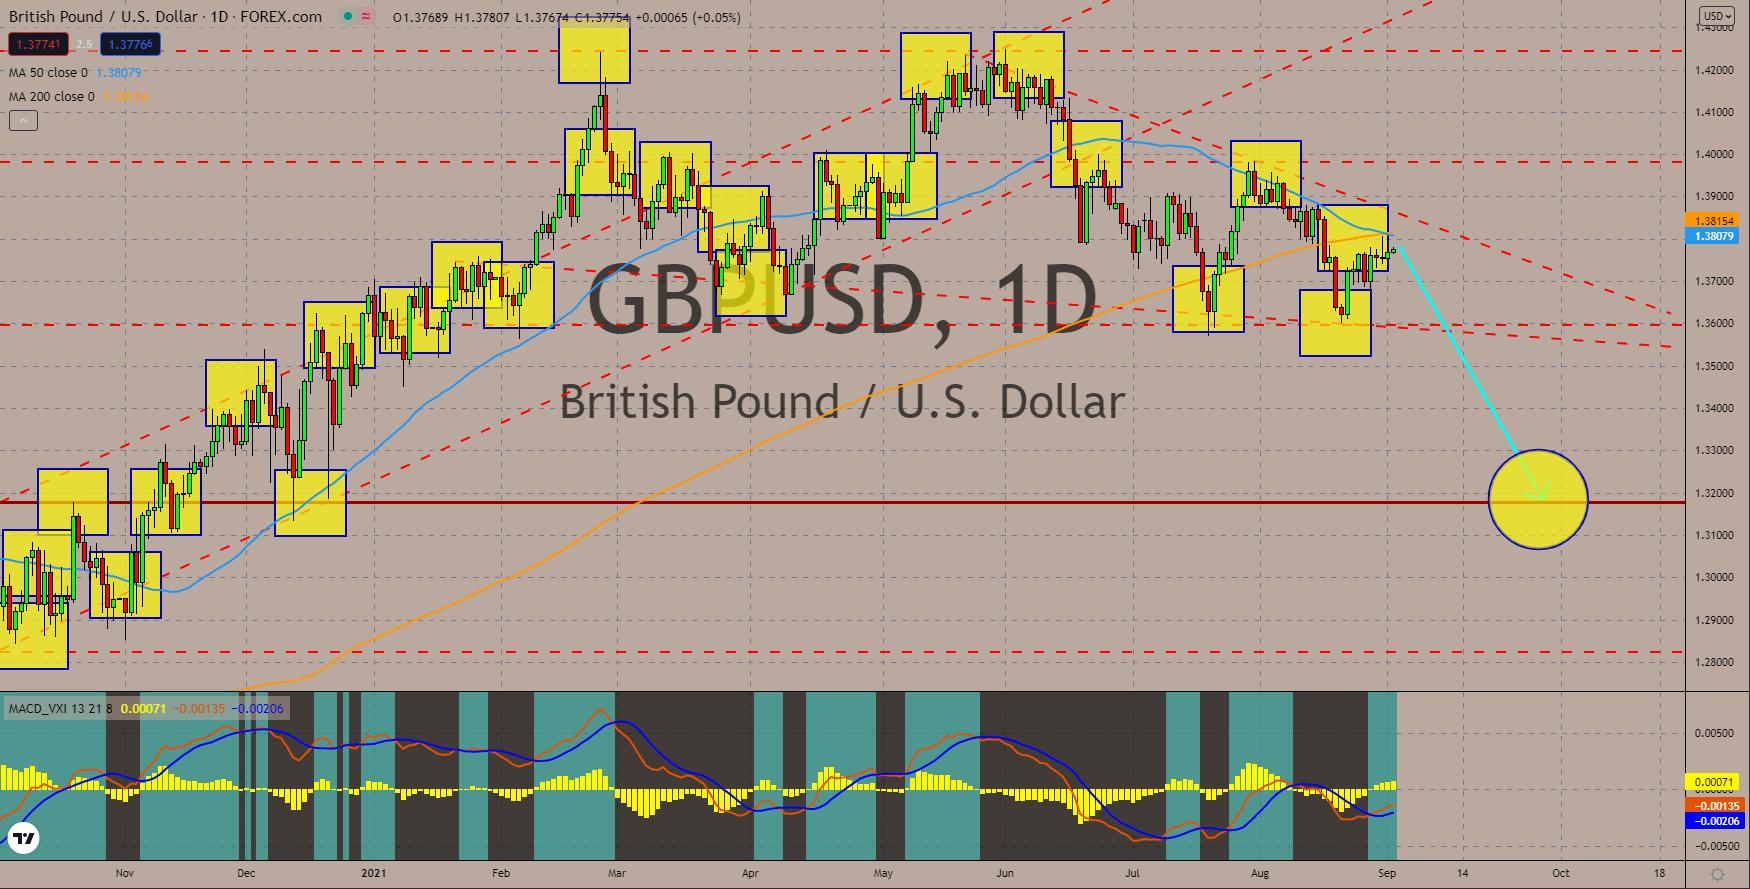 Charts, Daily Market Charts and Analysis September 02, 2021